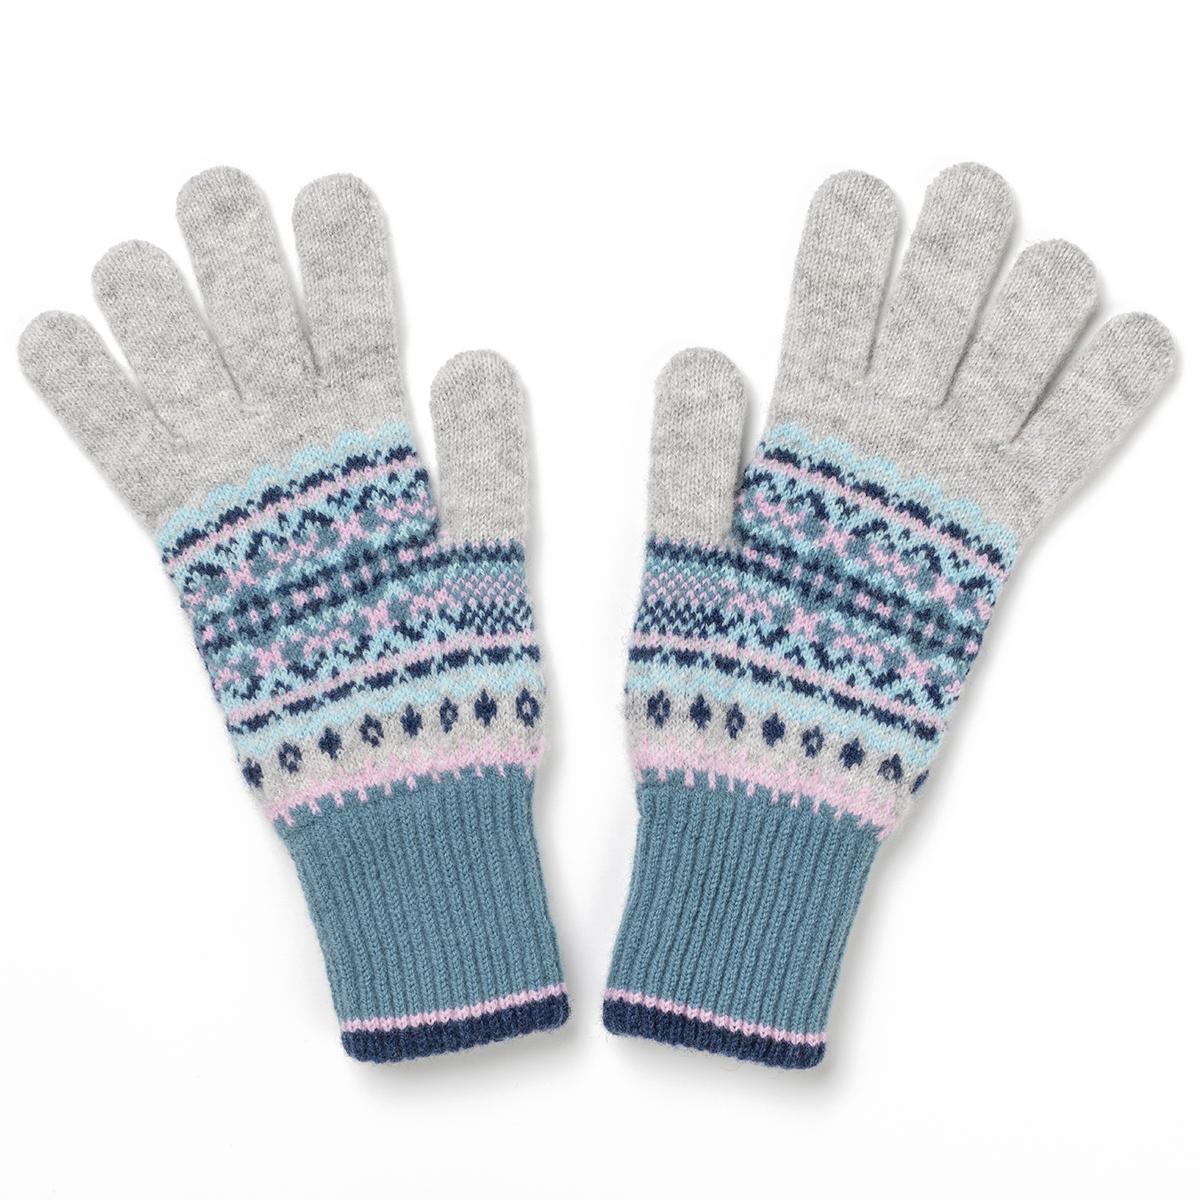 Alloa Arctic blossom gloves